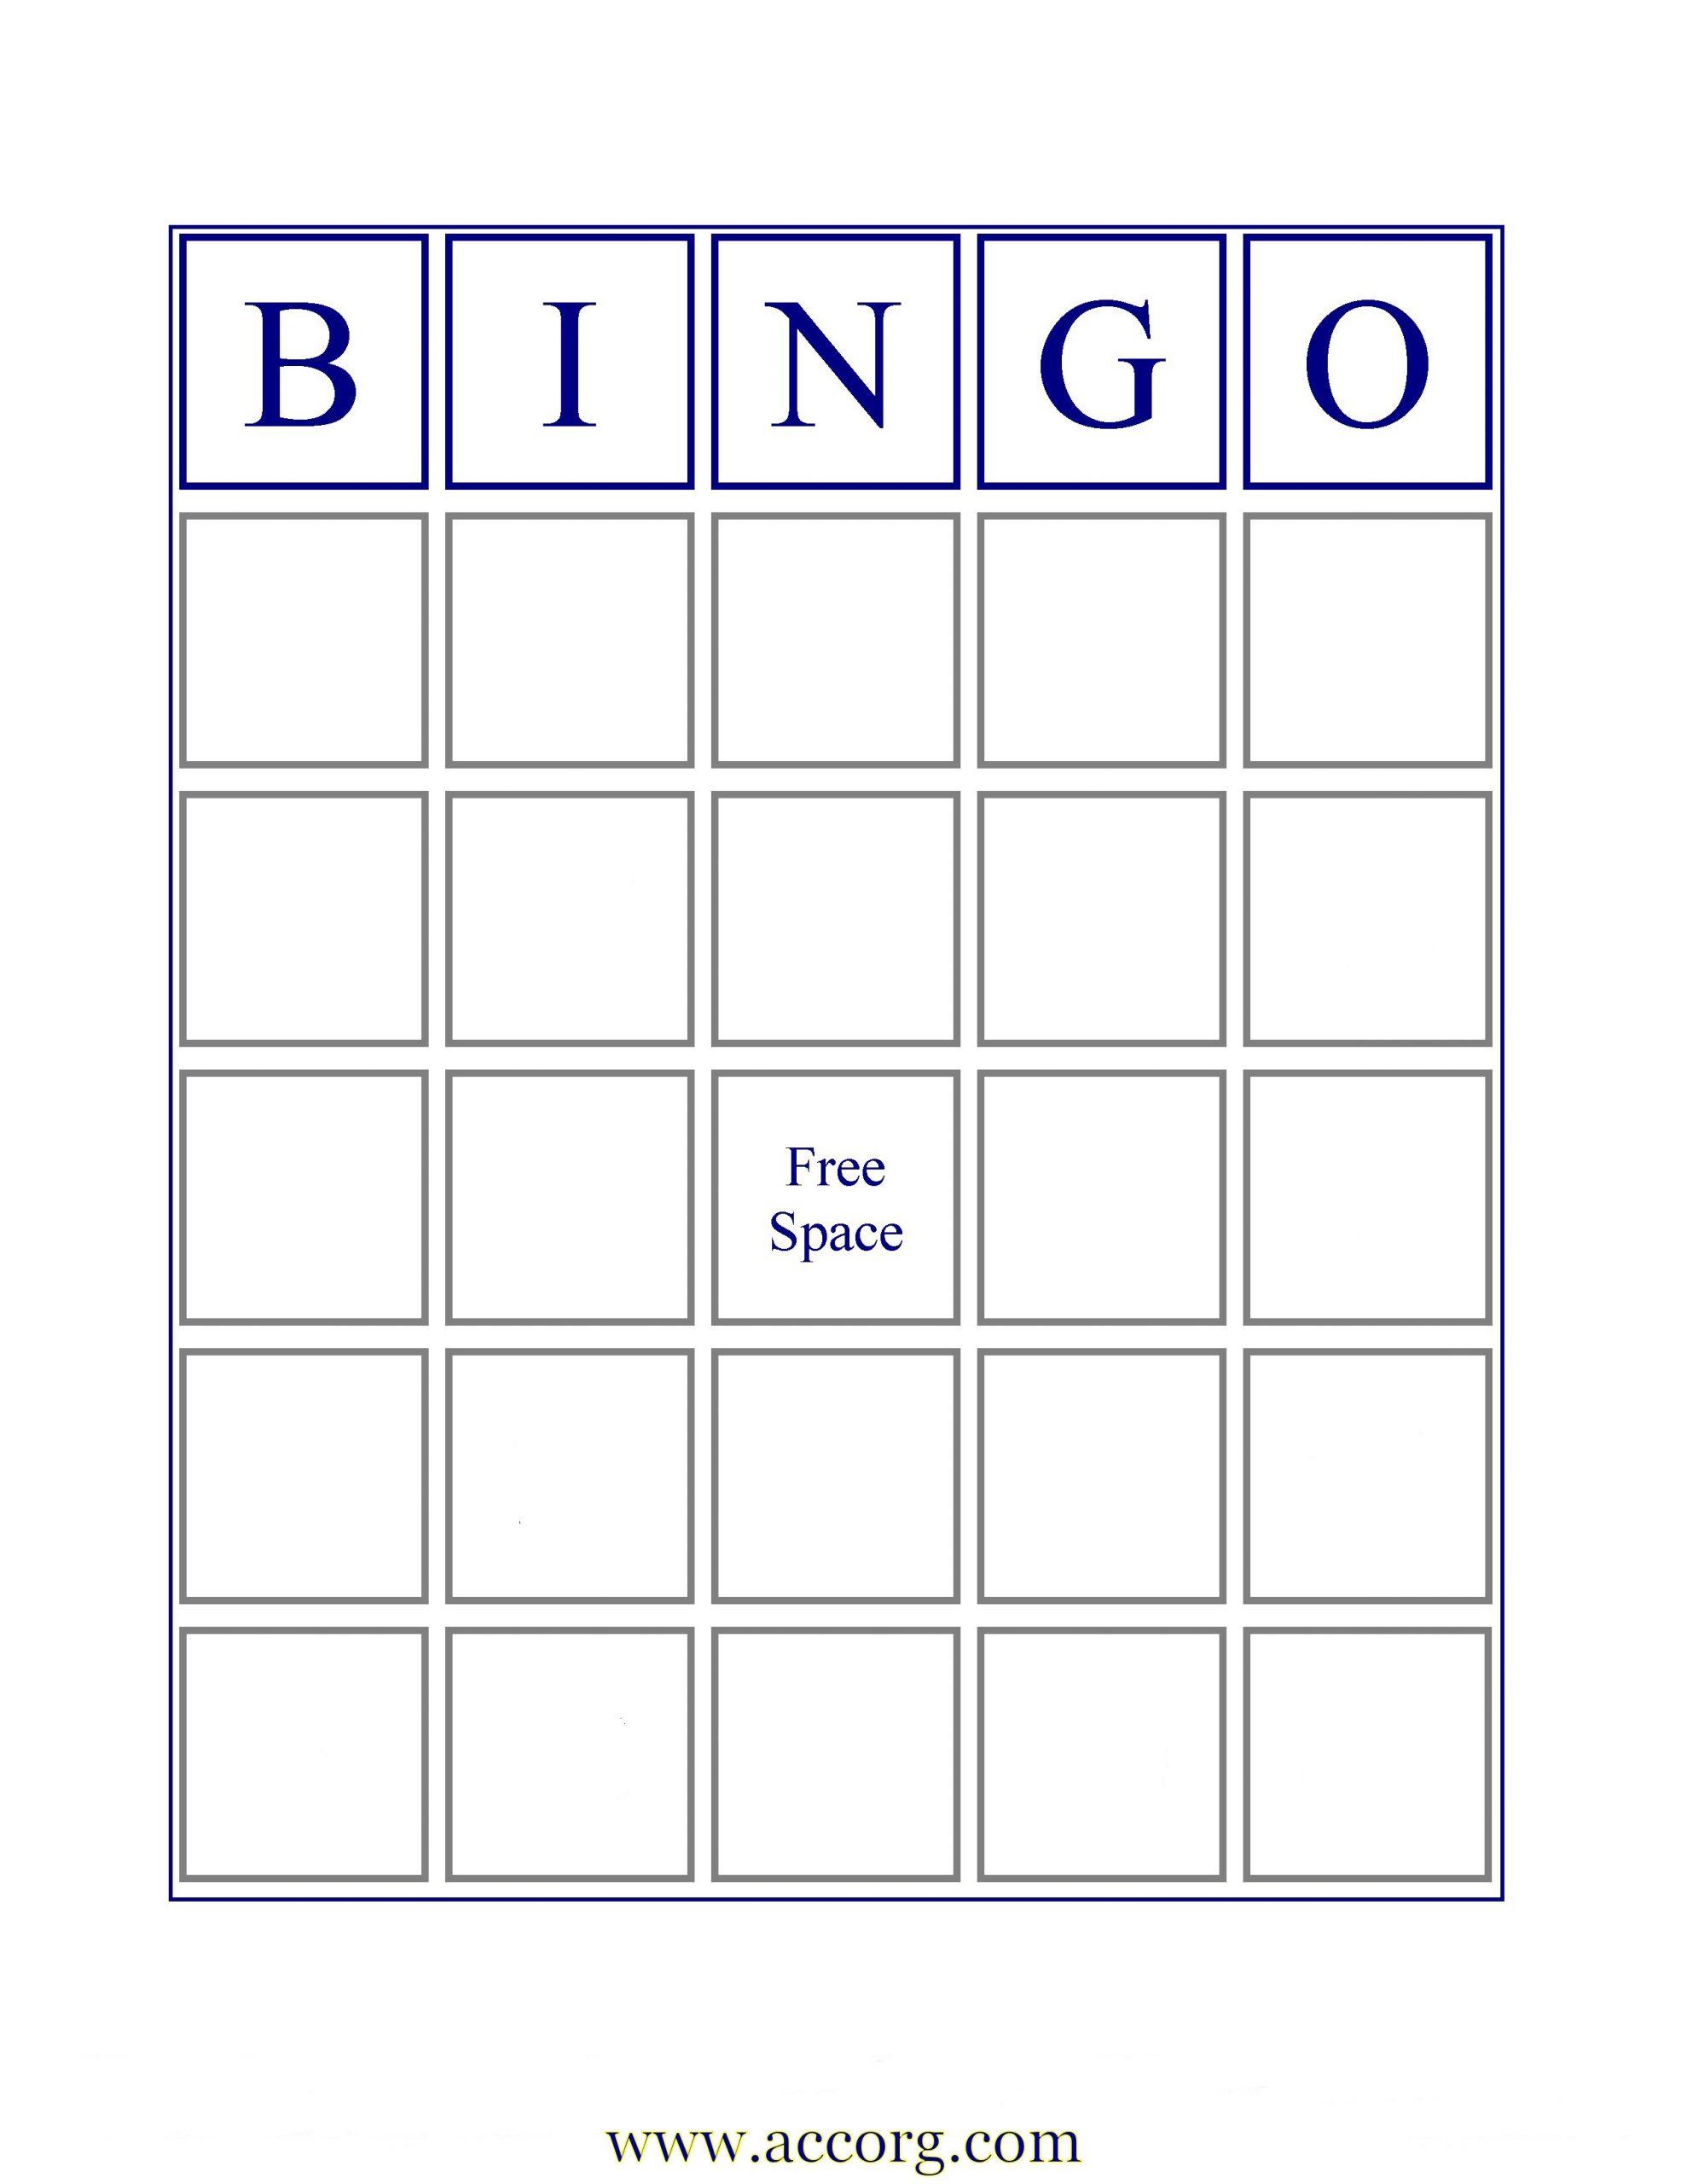 International Bingo Association - Downloads